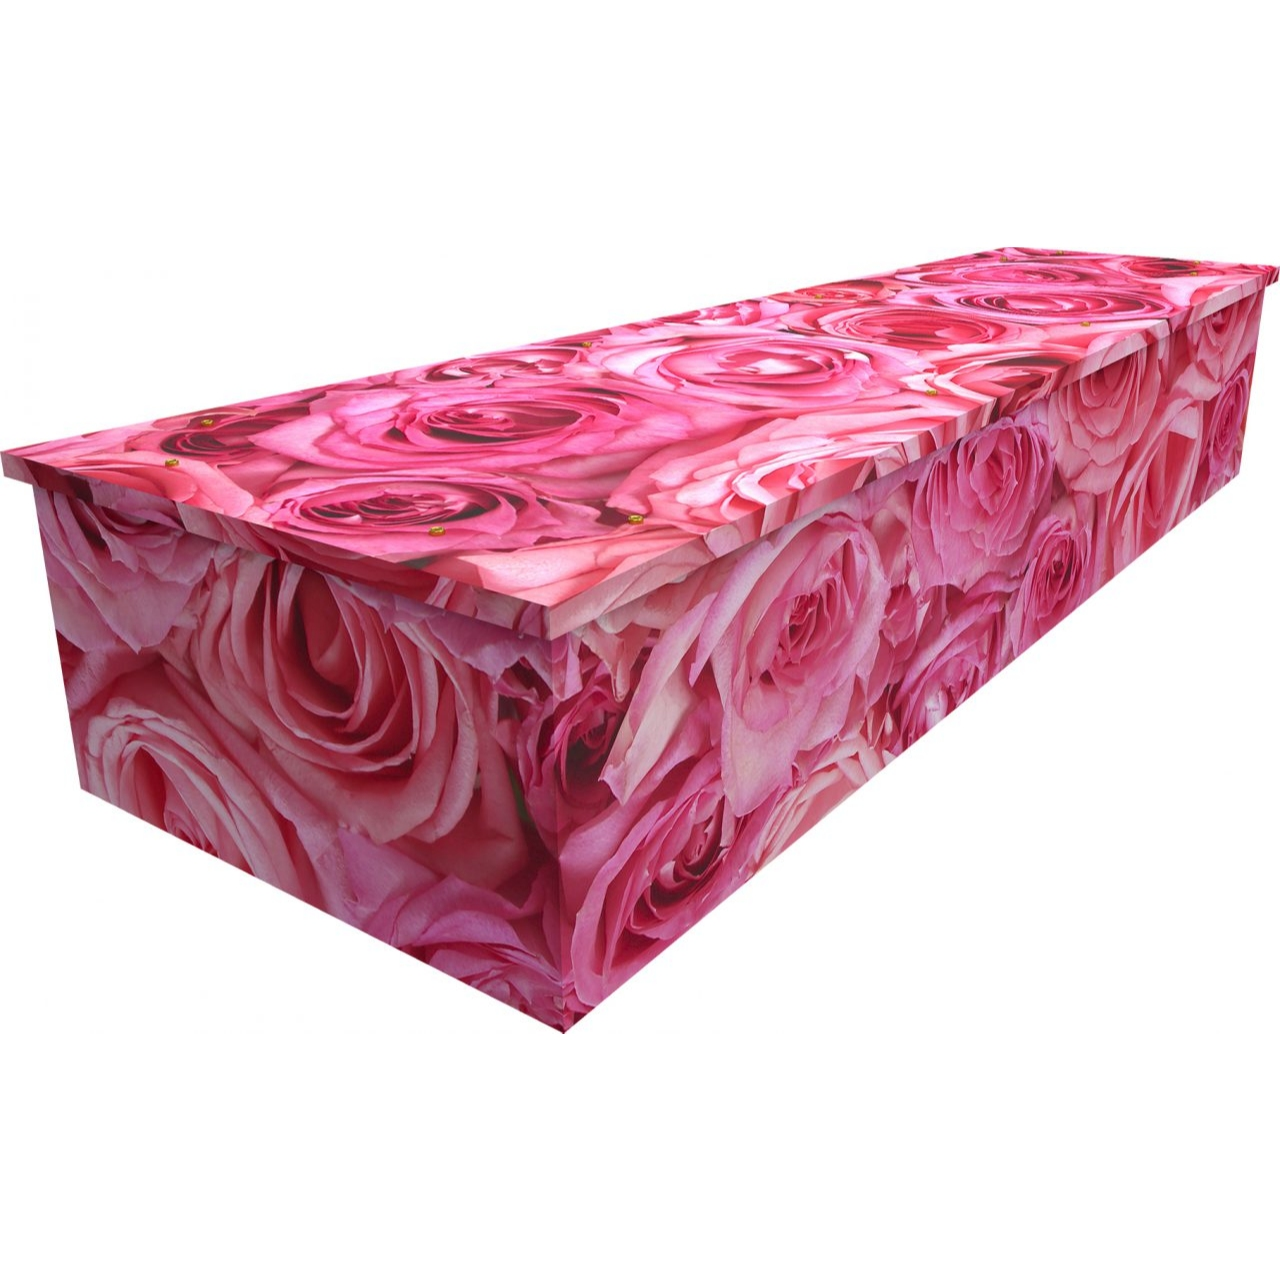 Pink Rose Cardboard Coffin